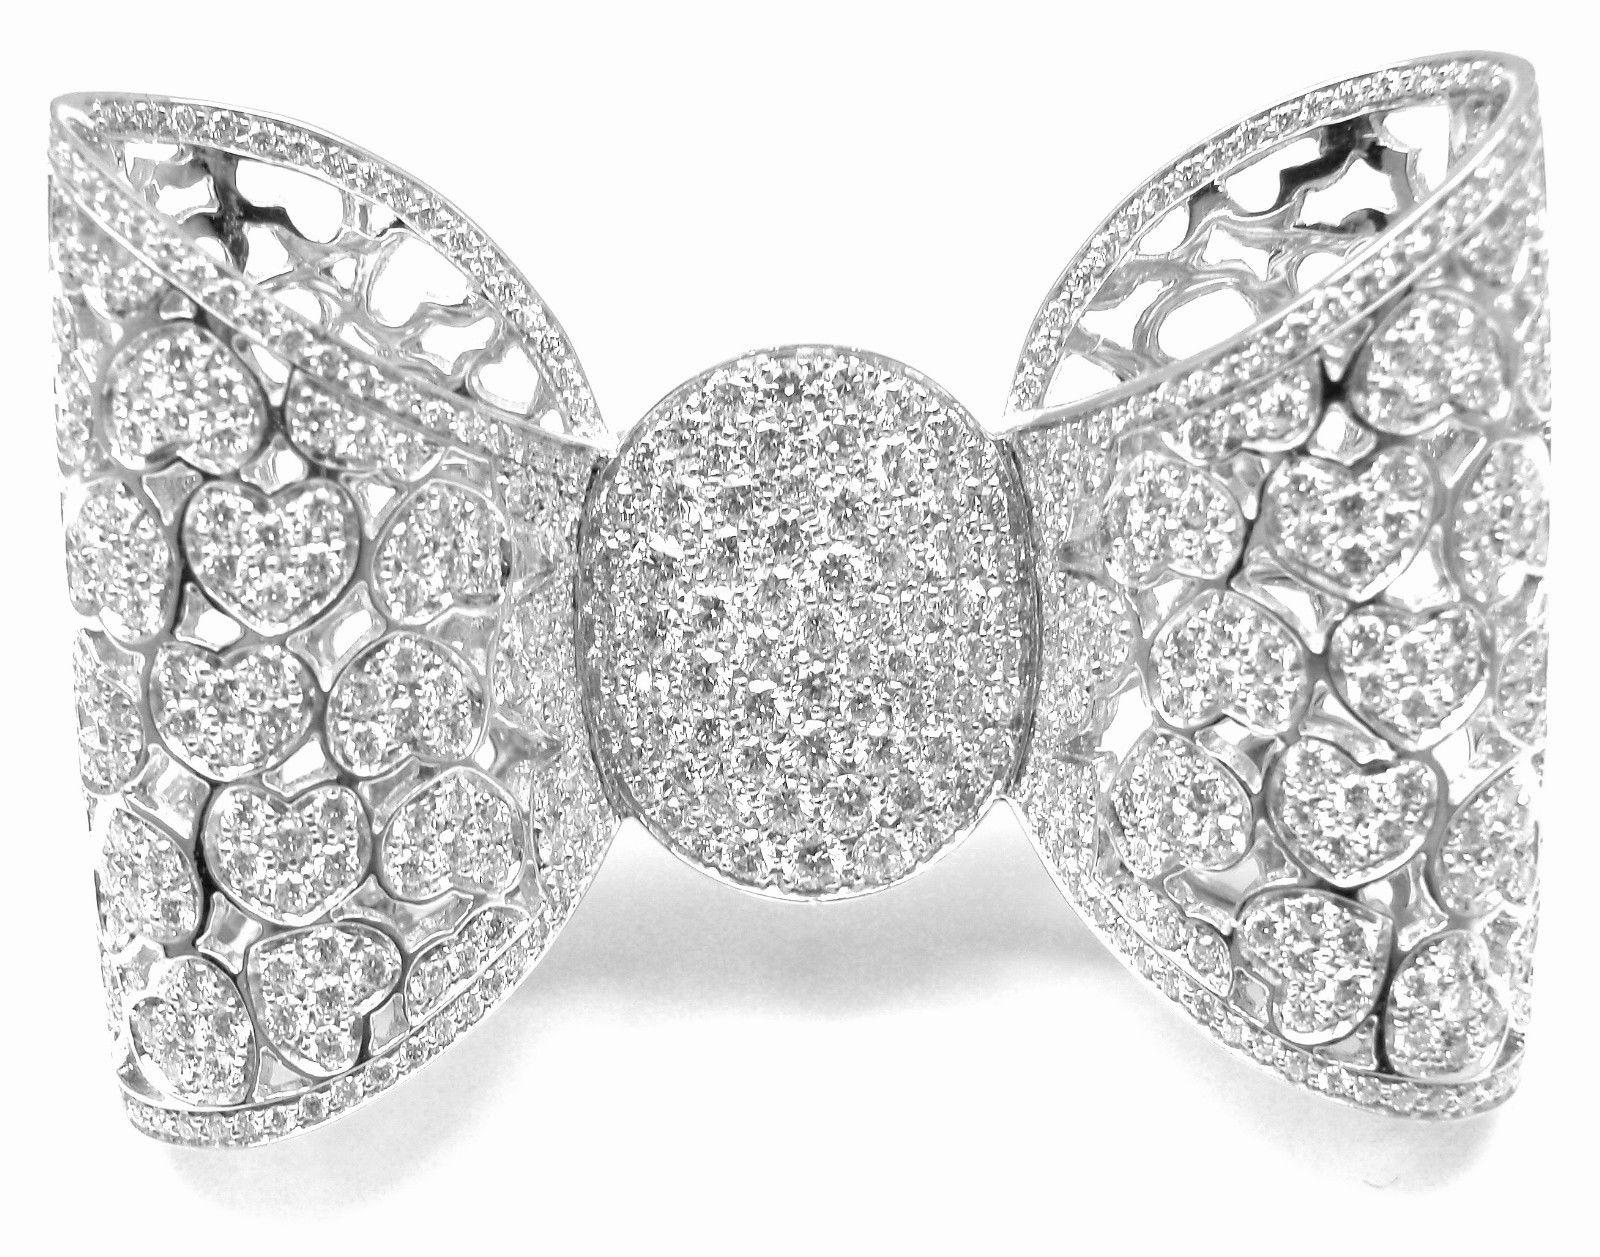 """""Pasquale Bruni 18K White Gold Diamond Ring"""""" 273947"